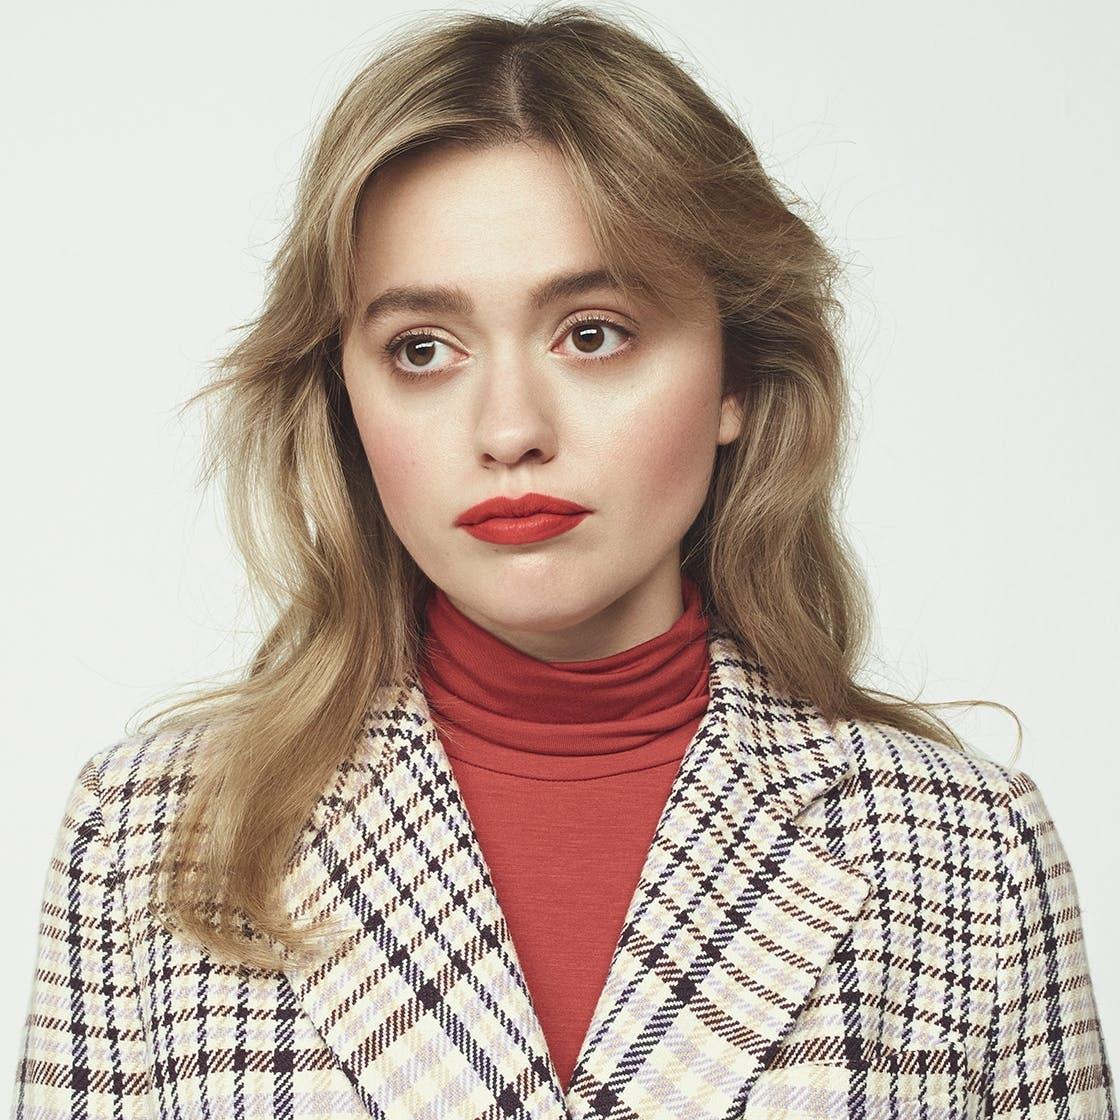 Sex Education star fears Aimee will die in season three as